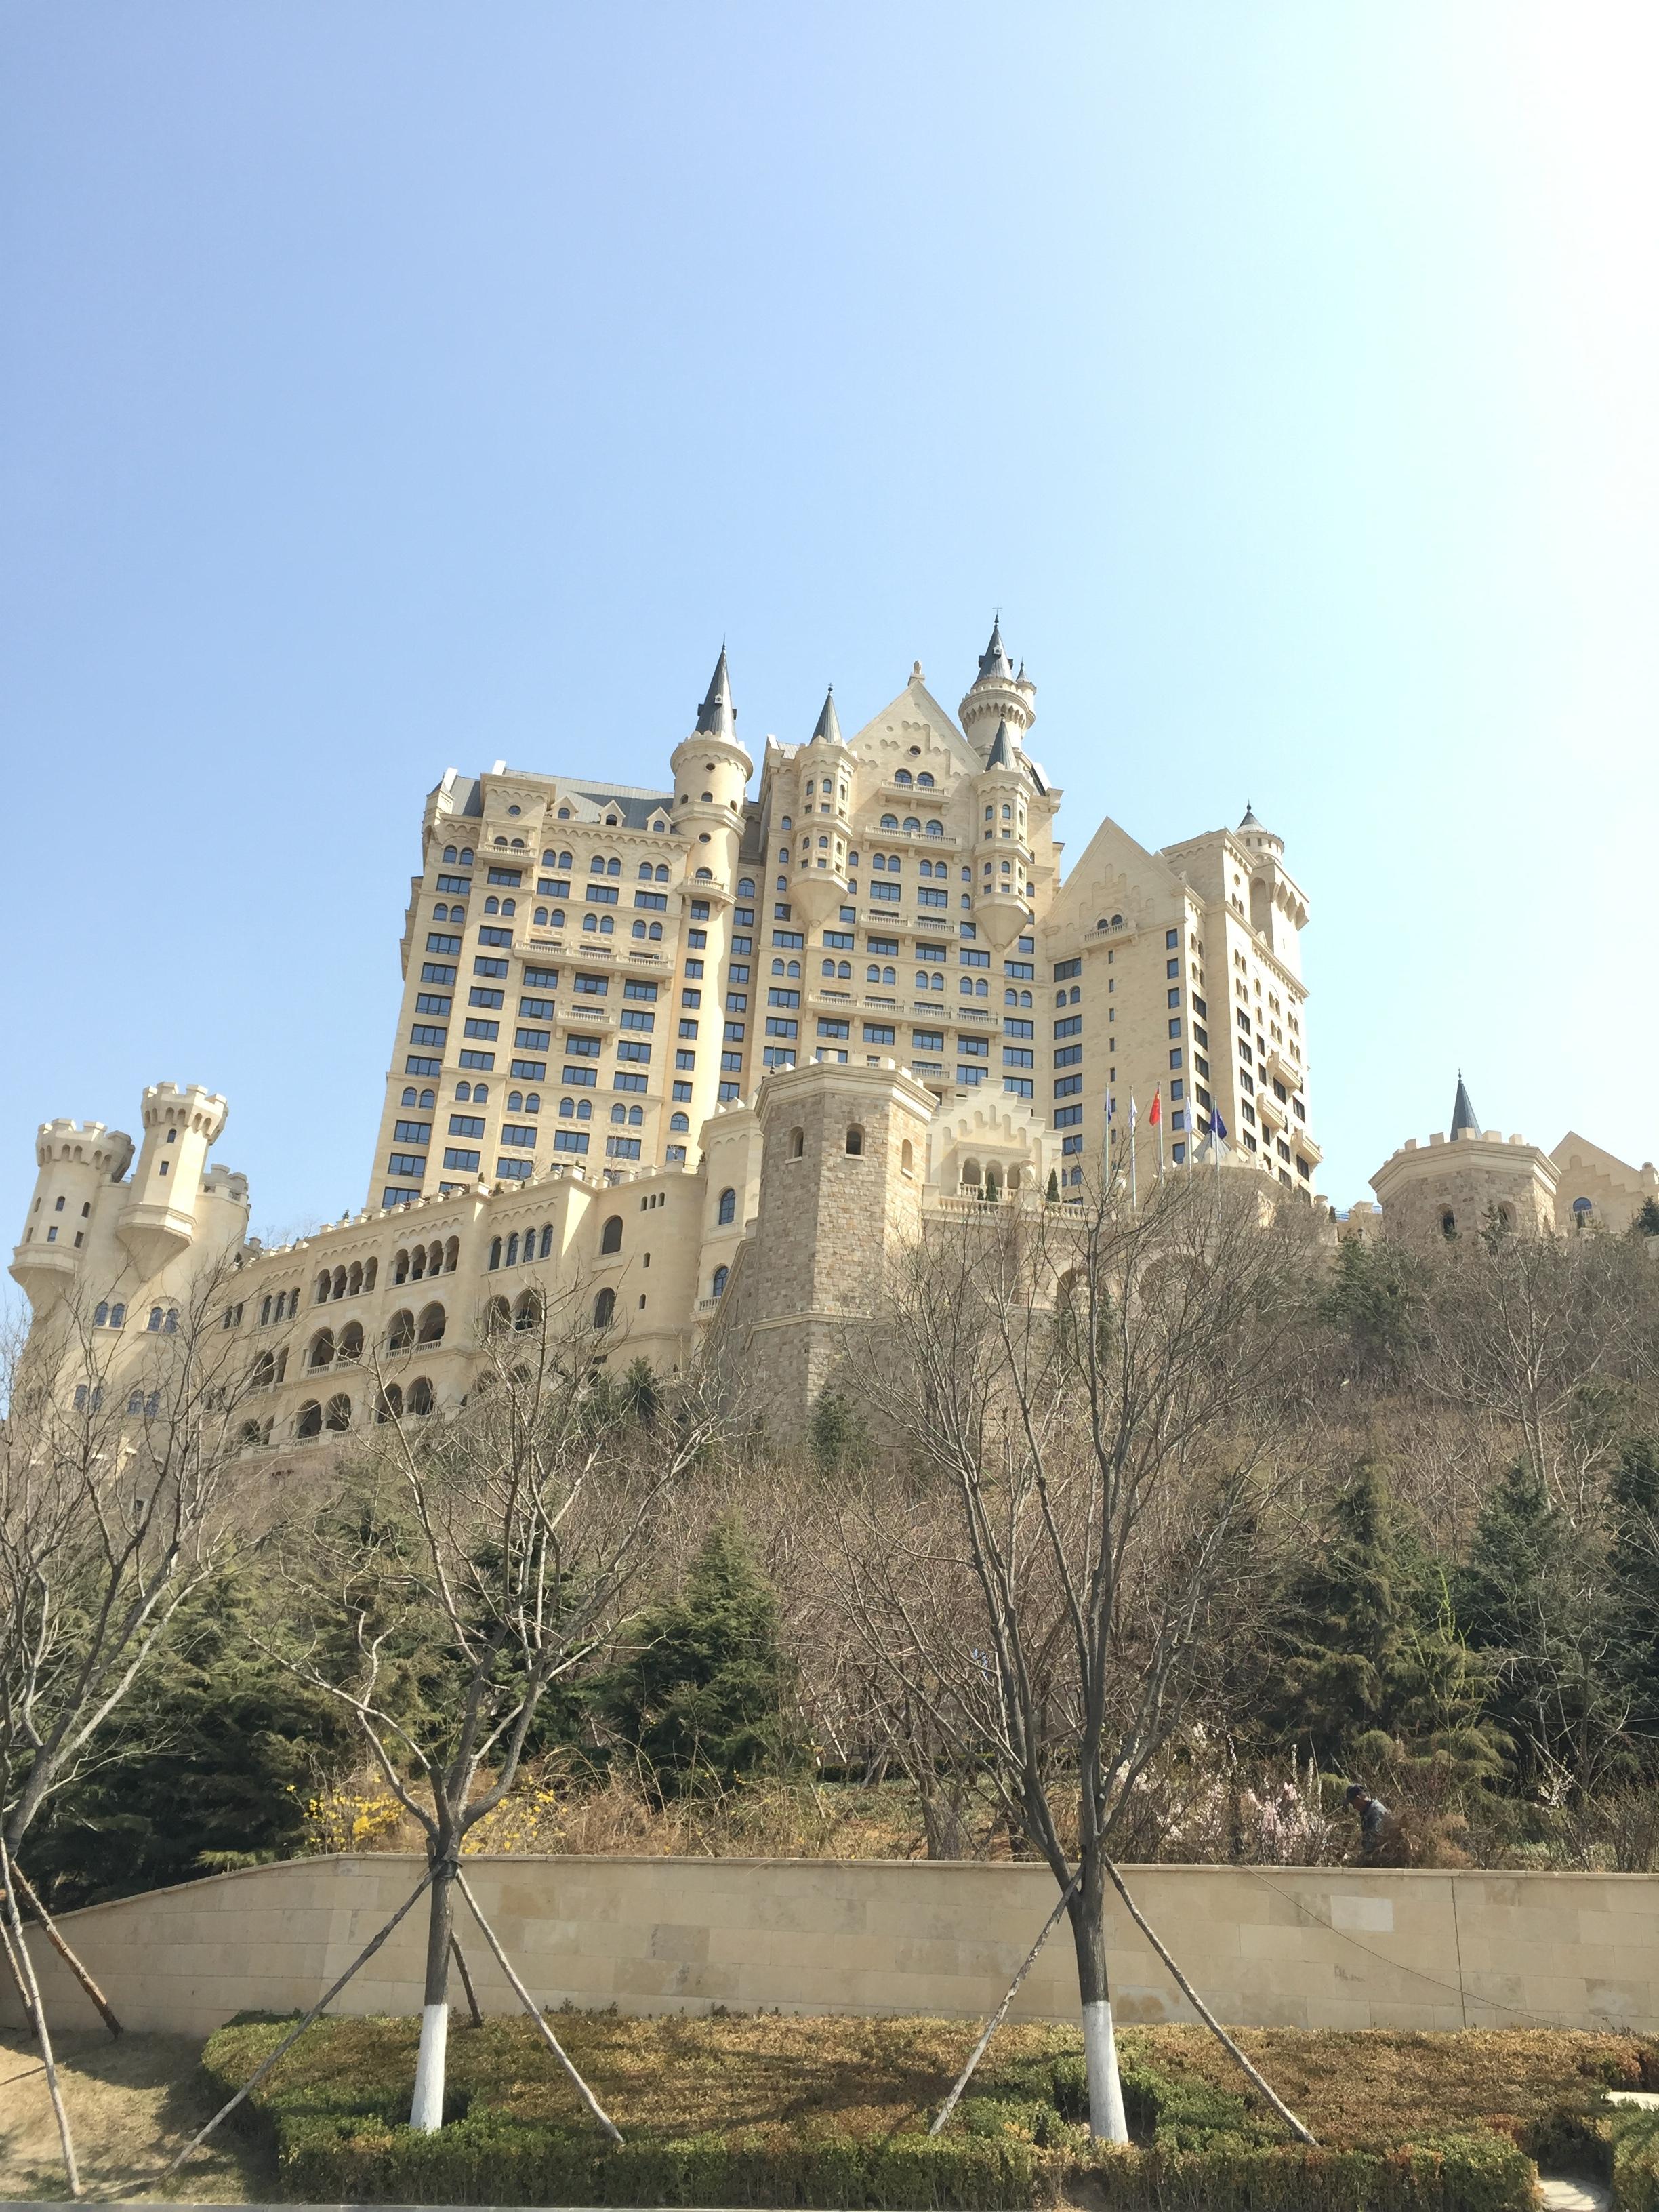 Castle hotel.